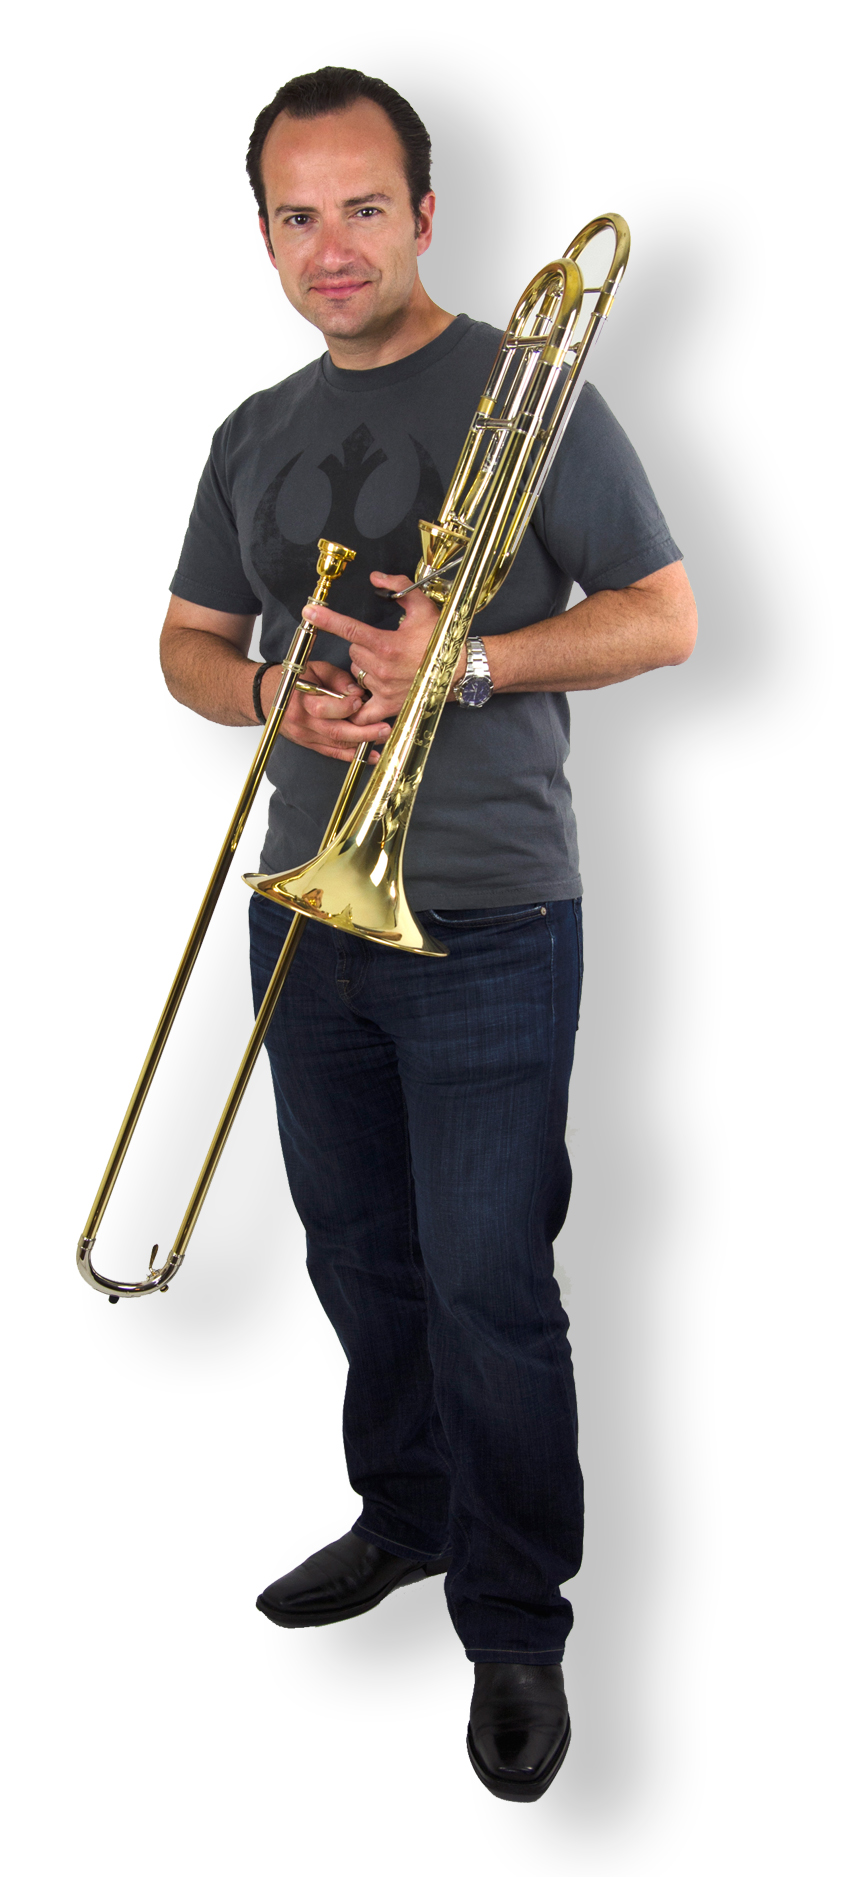 Jim nova